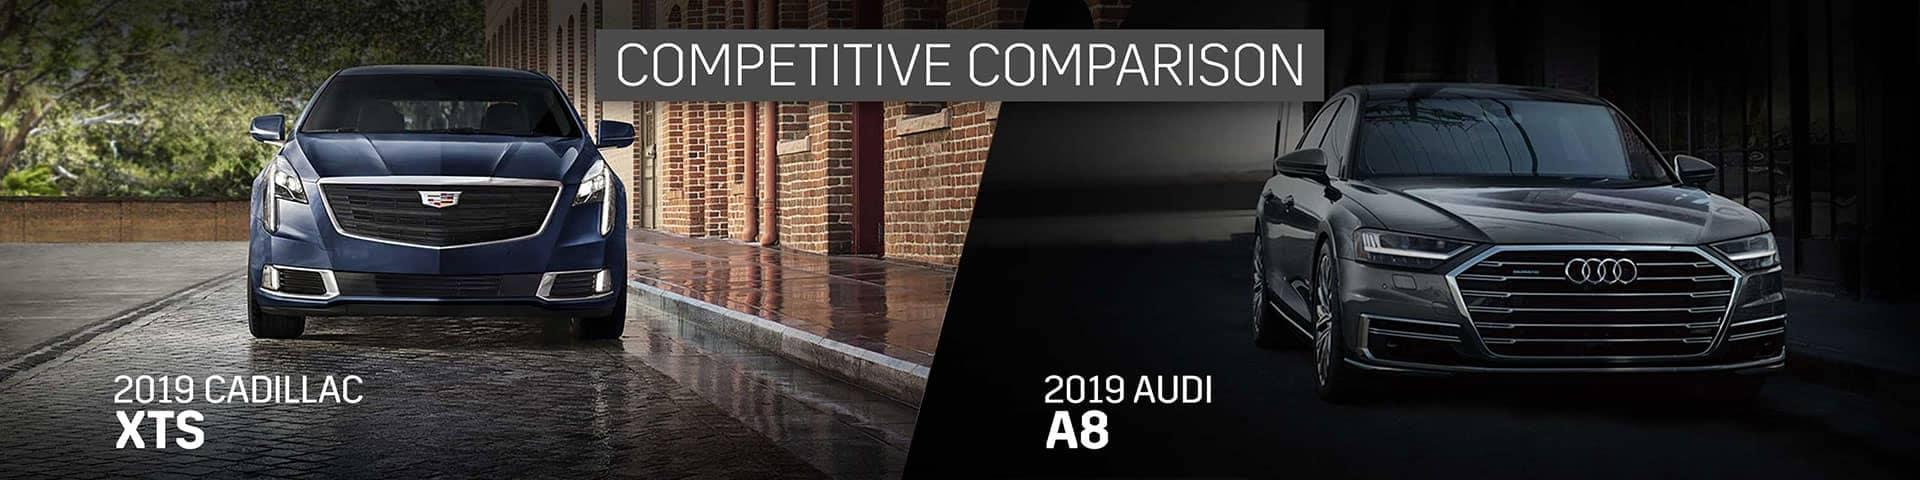 12-compare-2019-cadillac-xts